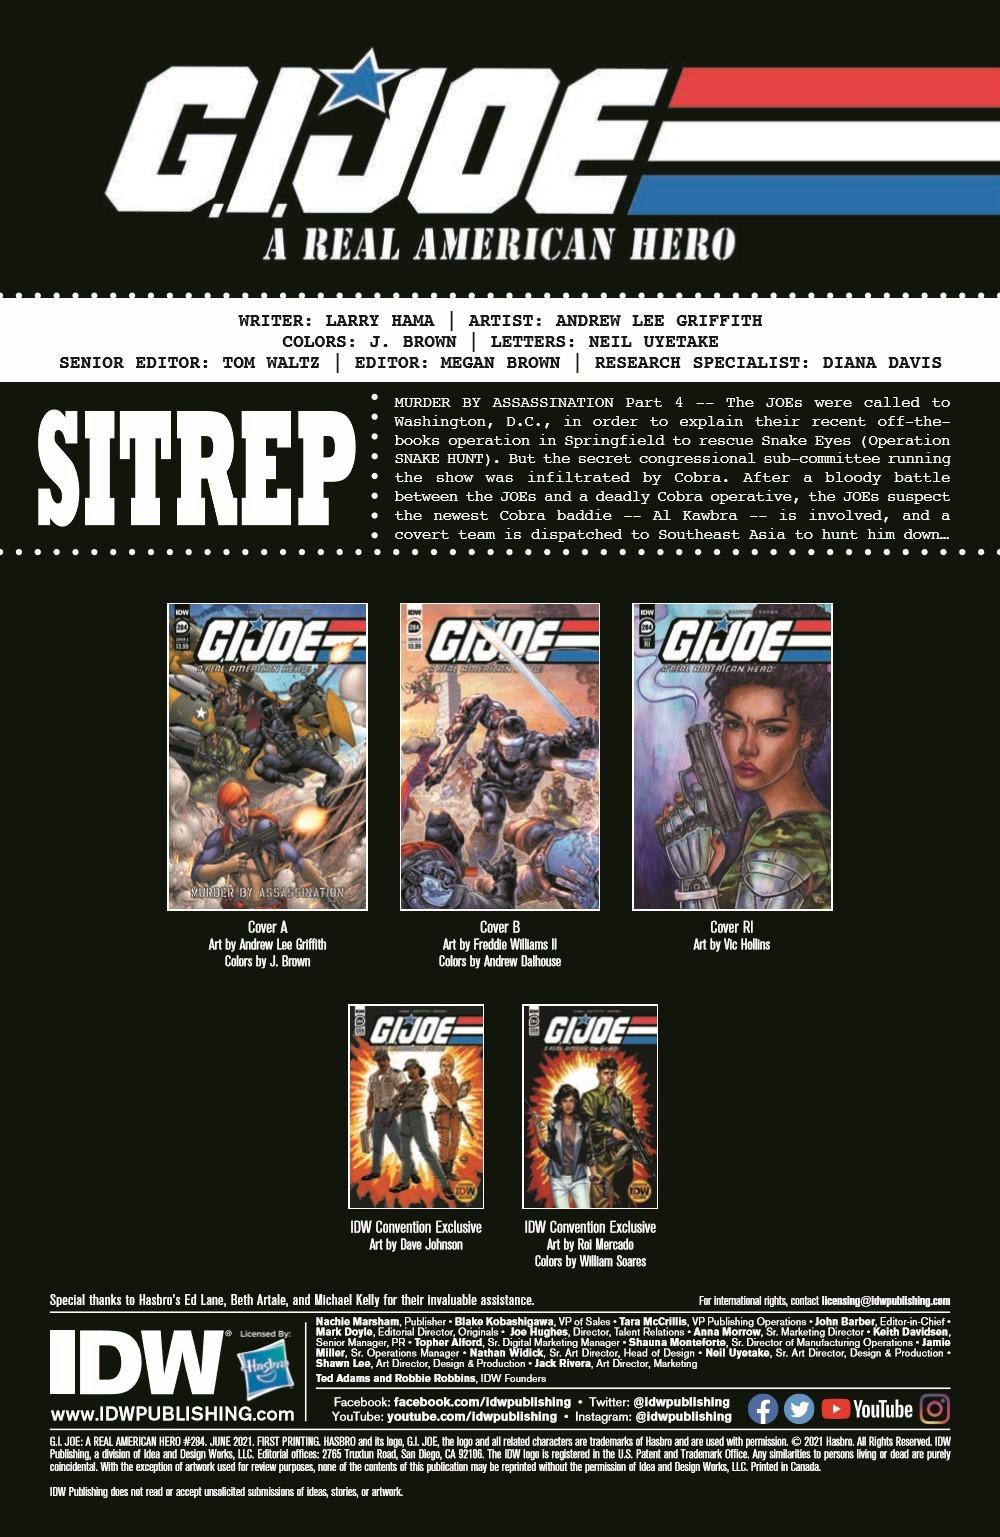 GIJoeRAH284-pr-2 ComicList Previews: G.I. JOE A REAL AMERICAN HERO #284